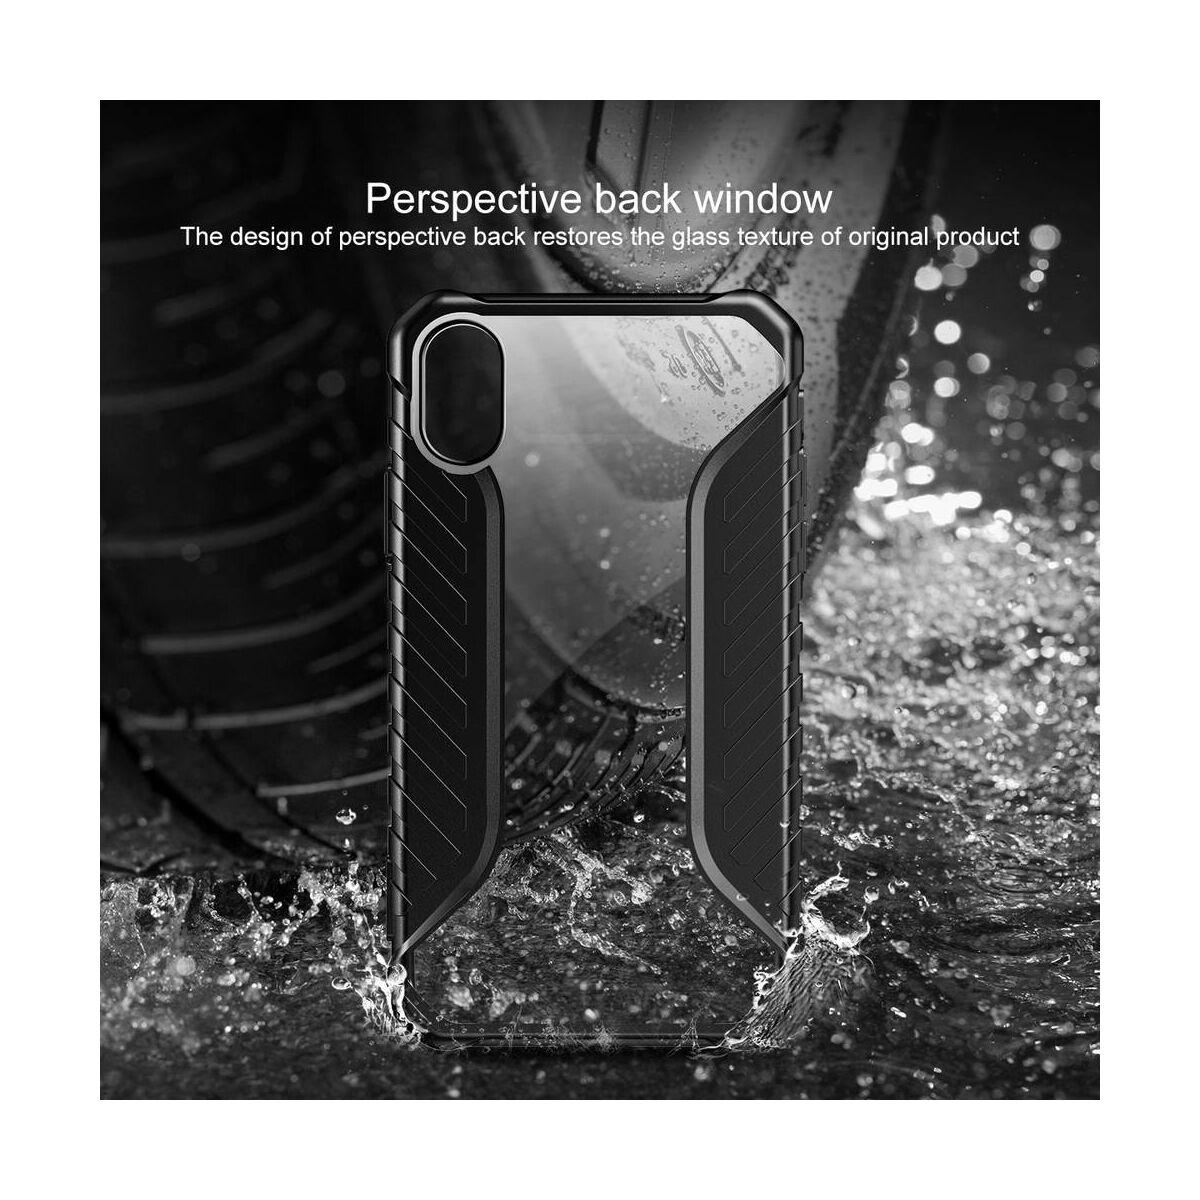 Baseus iPhone XR tok, Michelin, kék (WIAPIPH61-MK03)